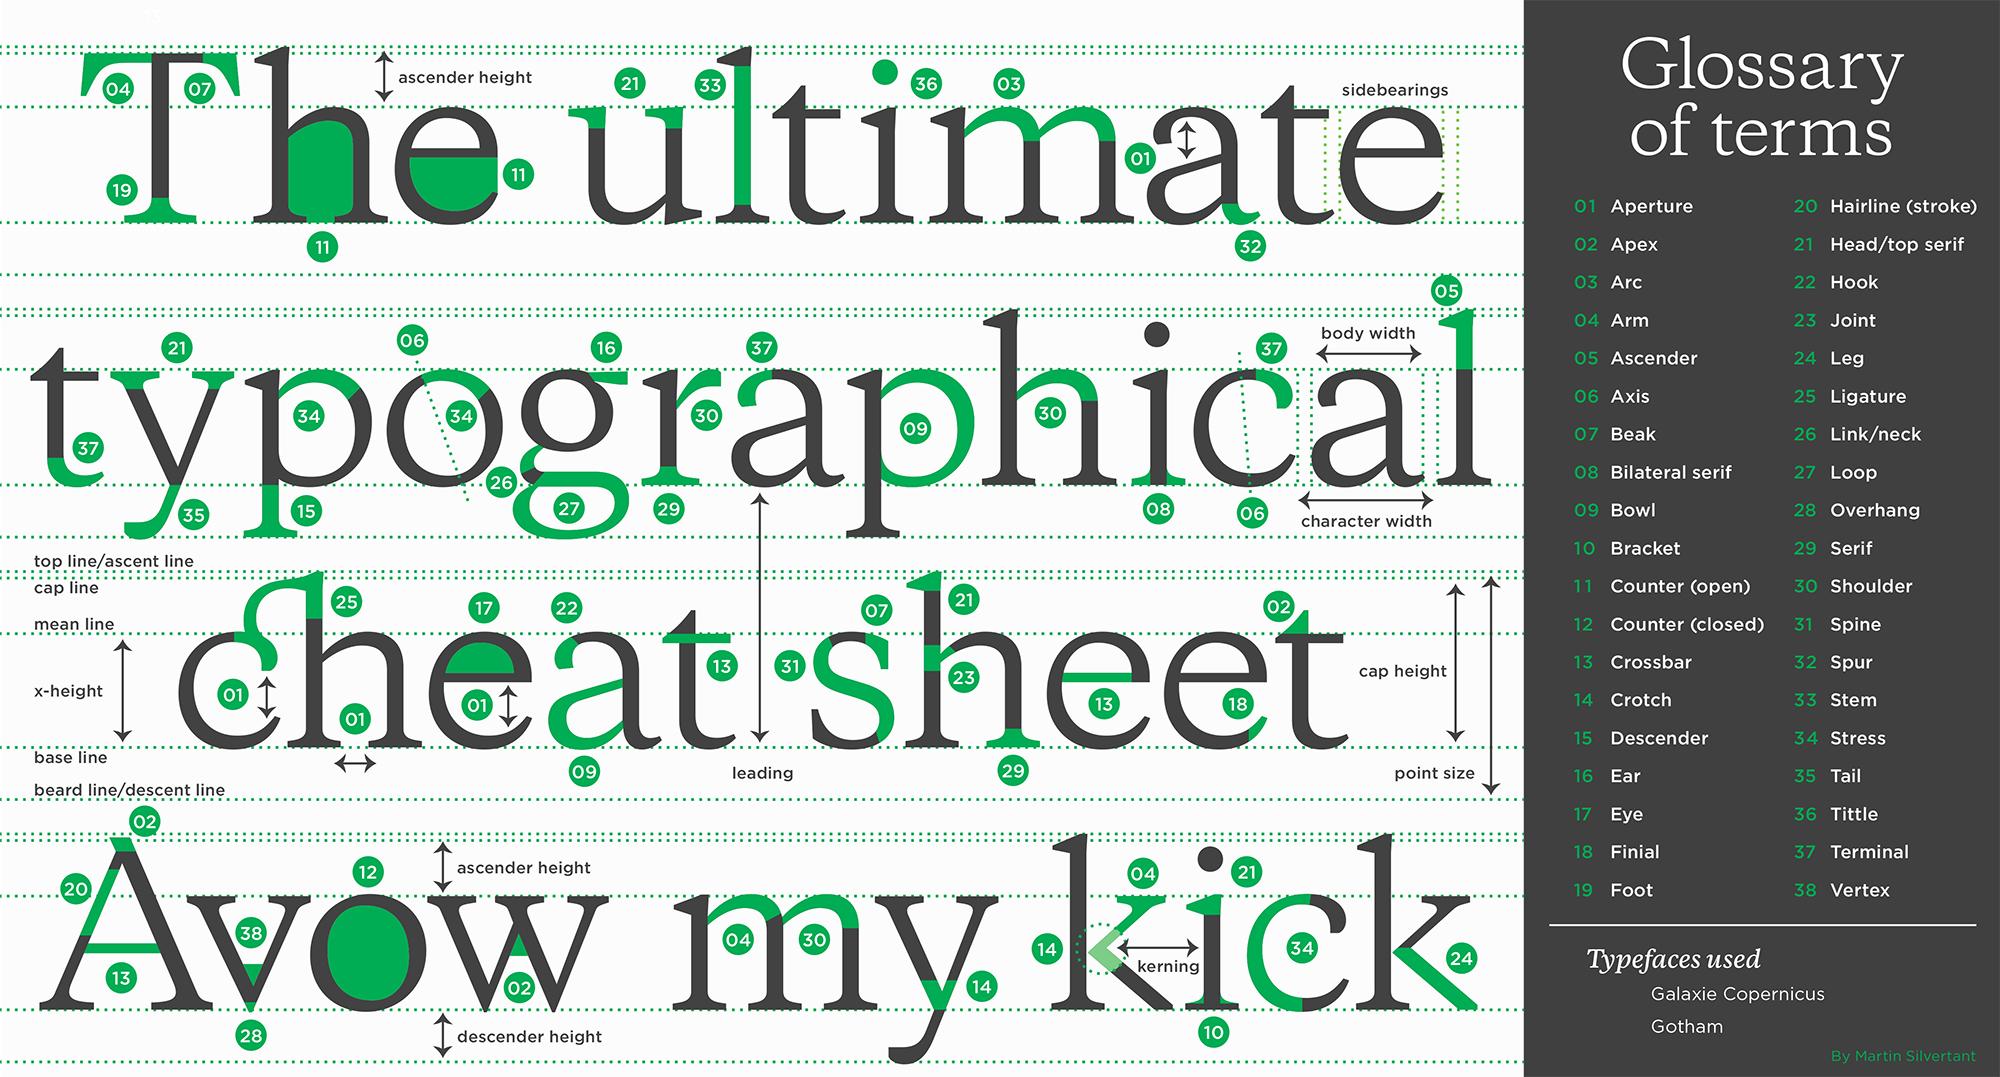 5 The Anatomy Of Typefaces The Anatomy Of Type Adoring Type Quora Type Anatomy Anatomy Of Typography Typeface